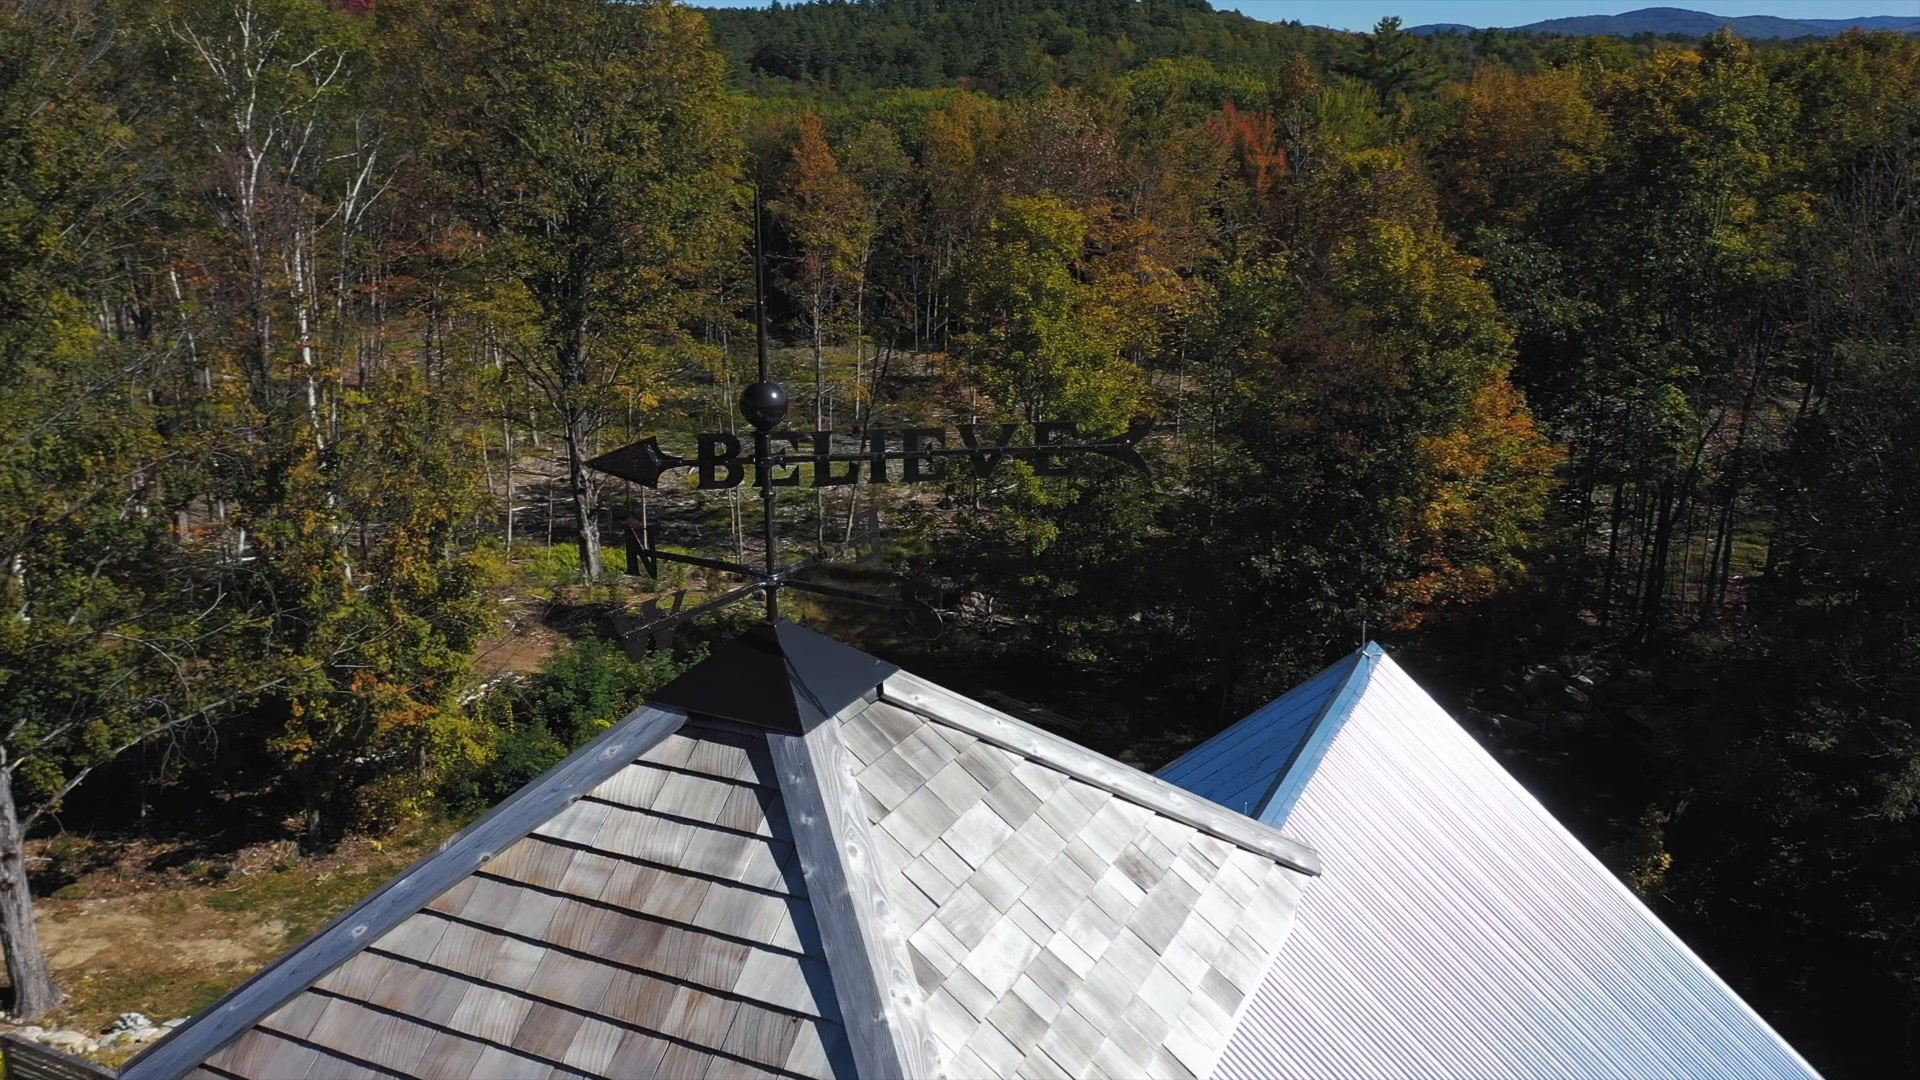 Jessie + Chris | Tamworth, New Hampshire | The Preserve at Chocorua